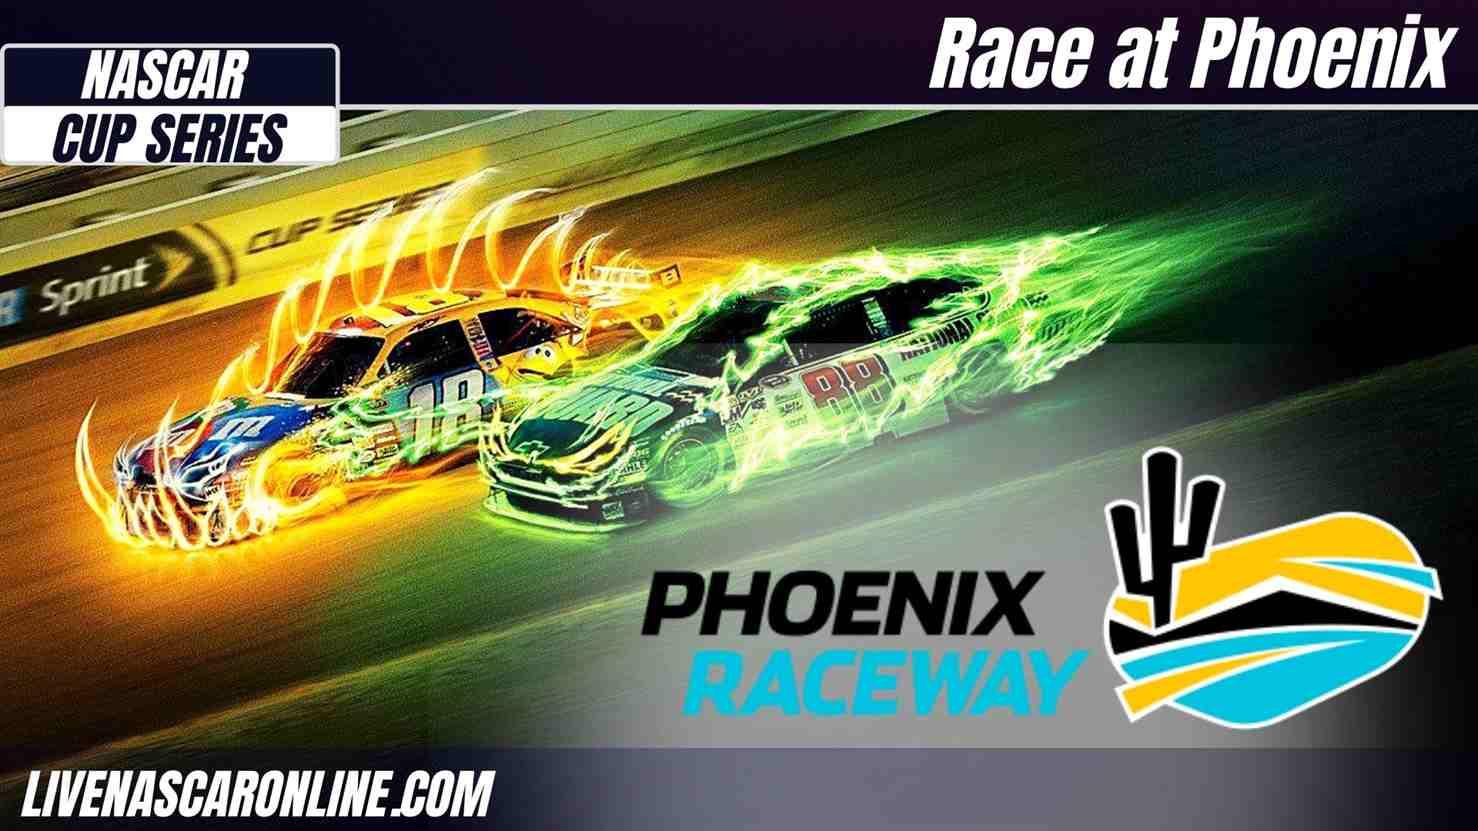 Nascar Cup Race at Phoenix Live Stream 2021